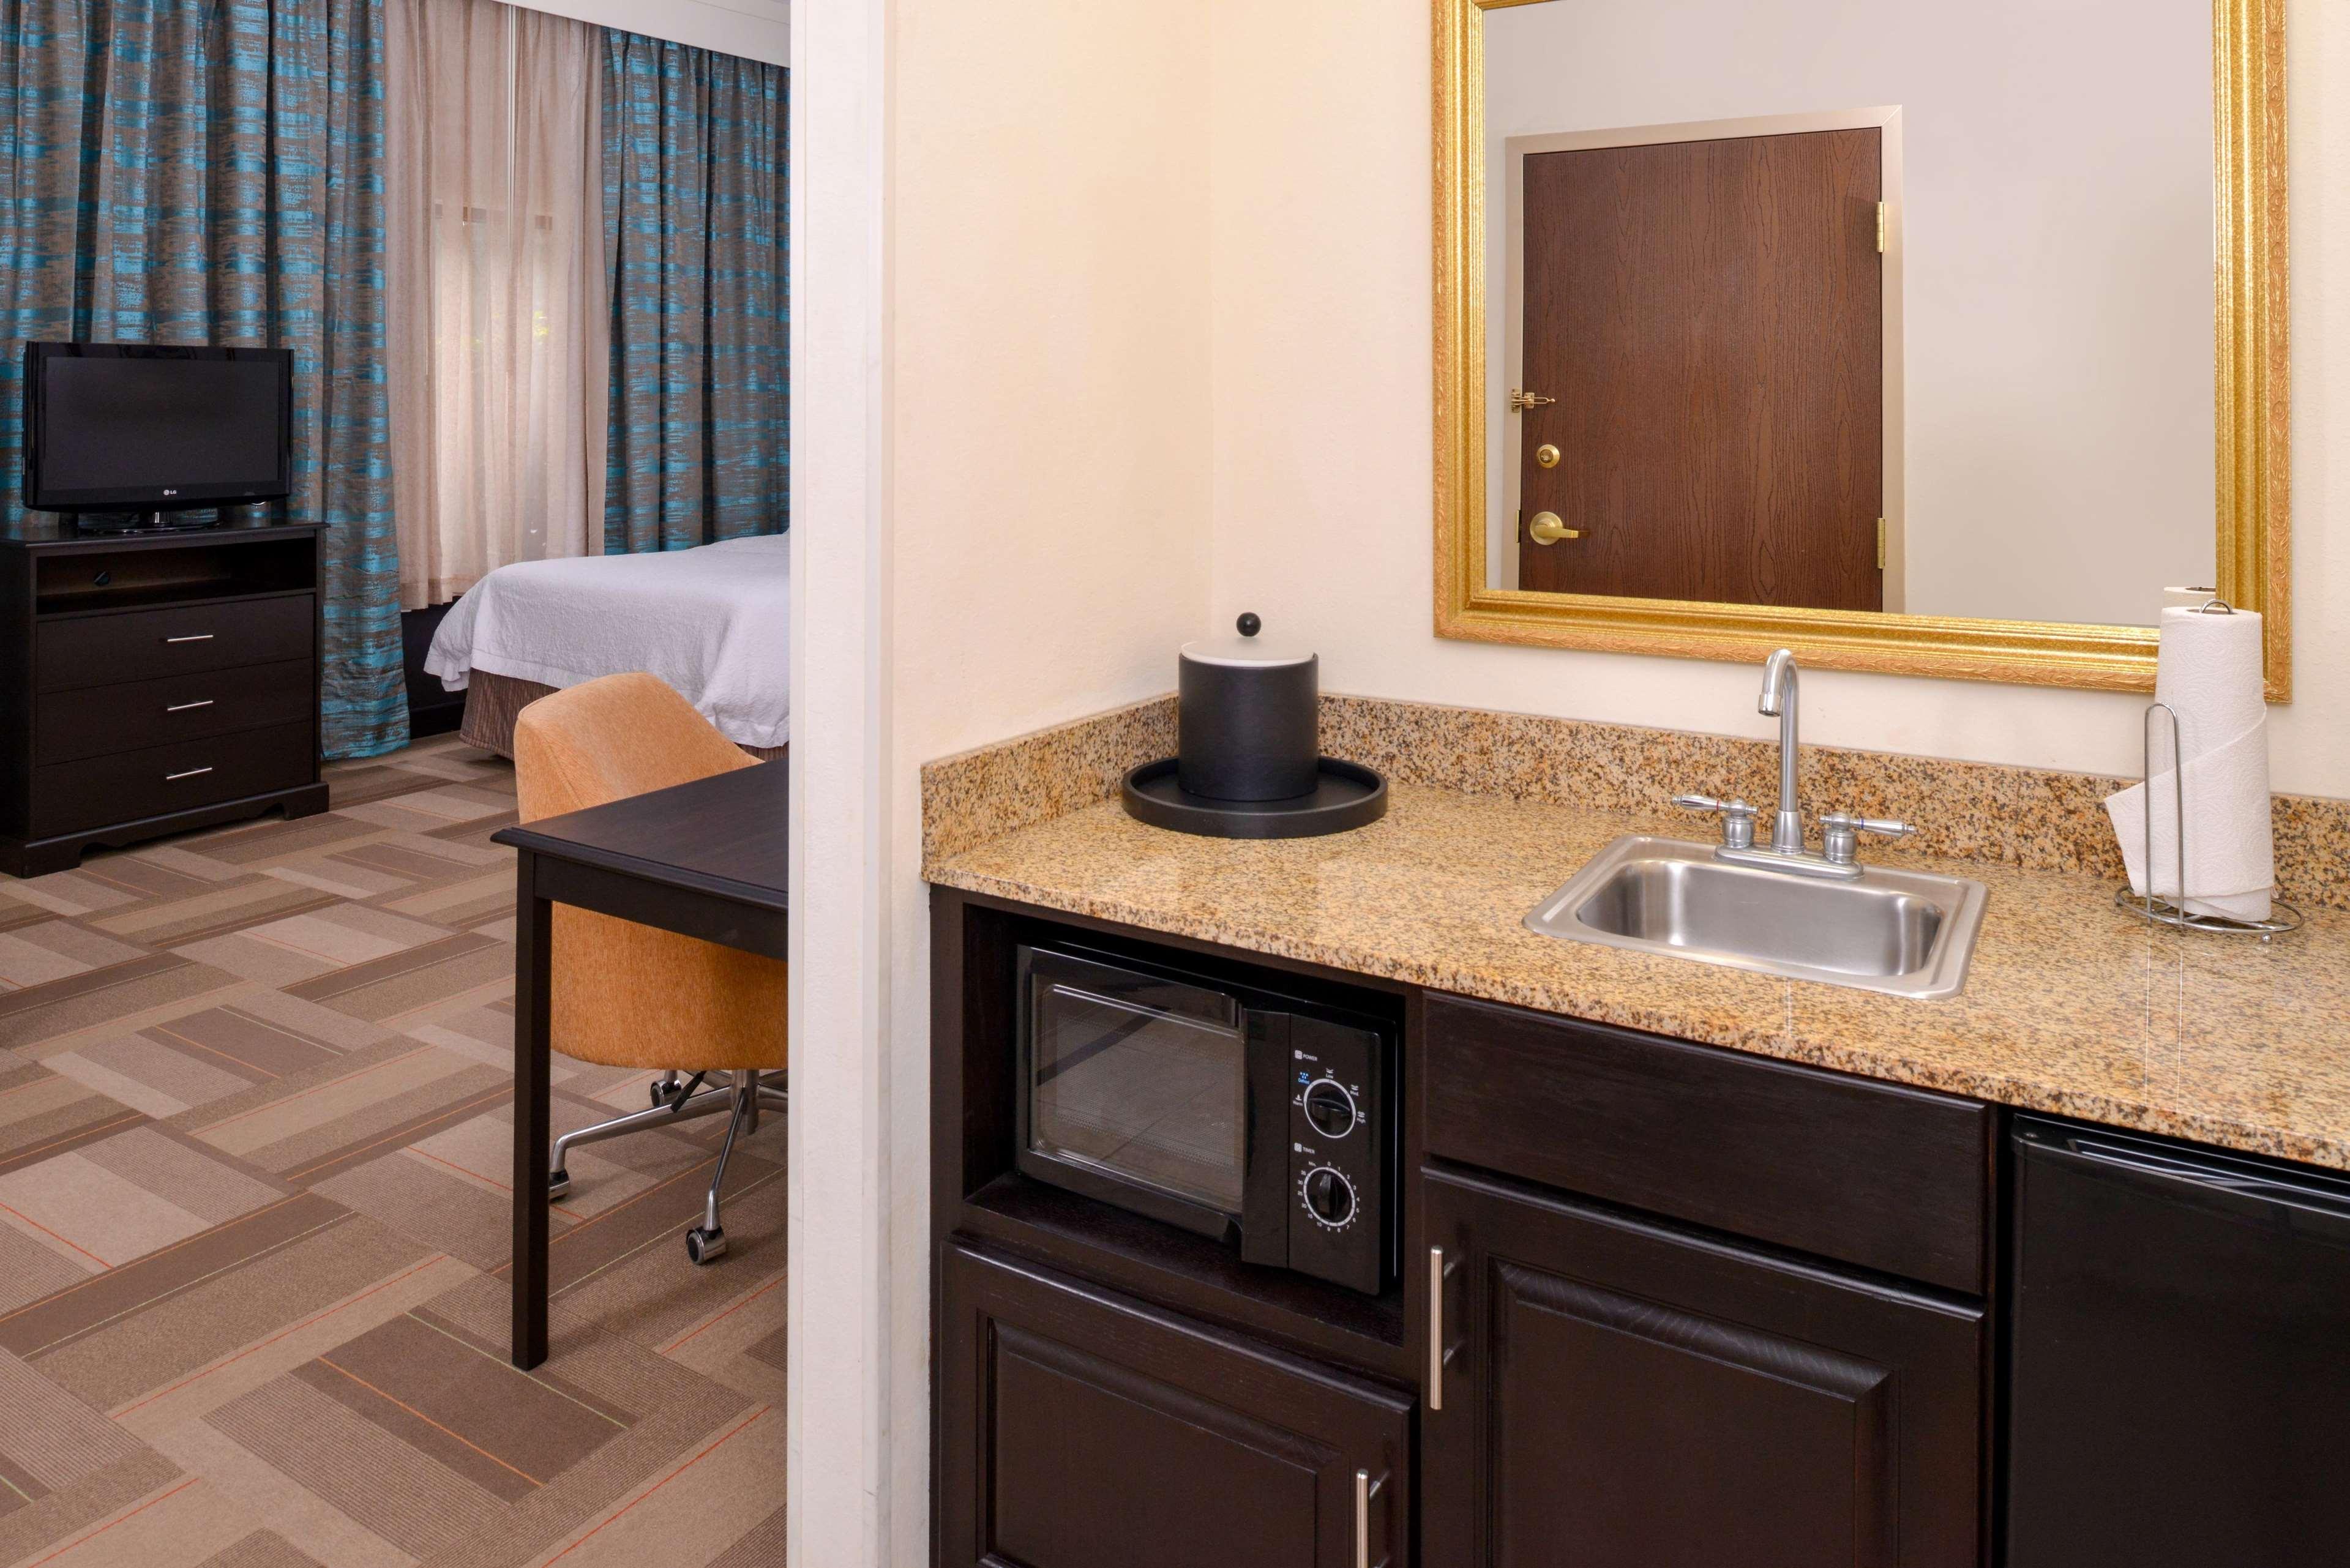 Hampton Inn & Suites Lady Lake/The Villages image 29